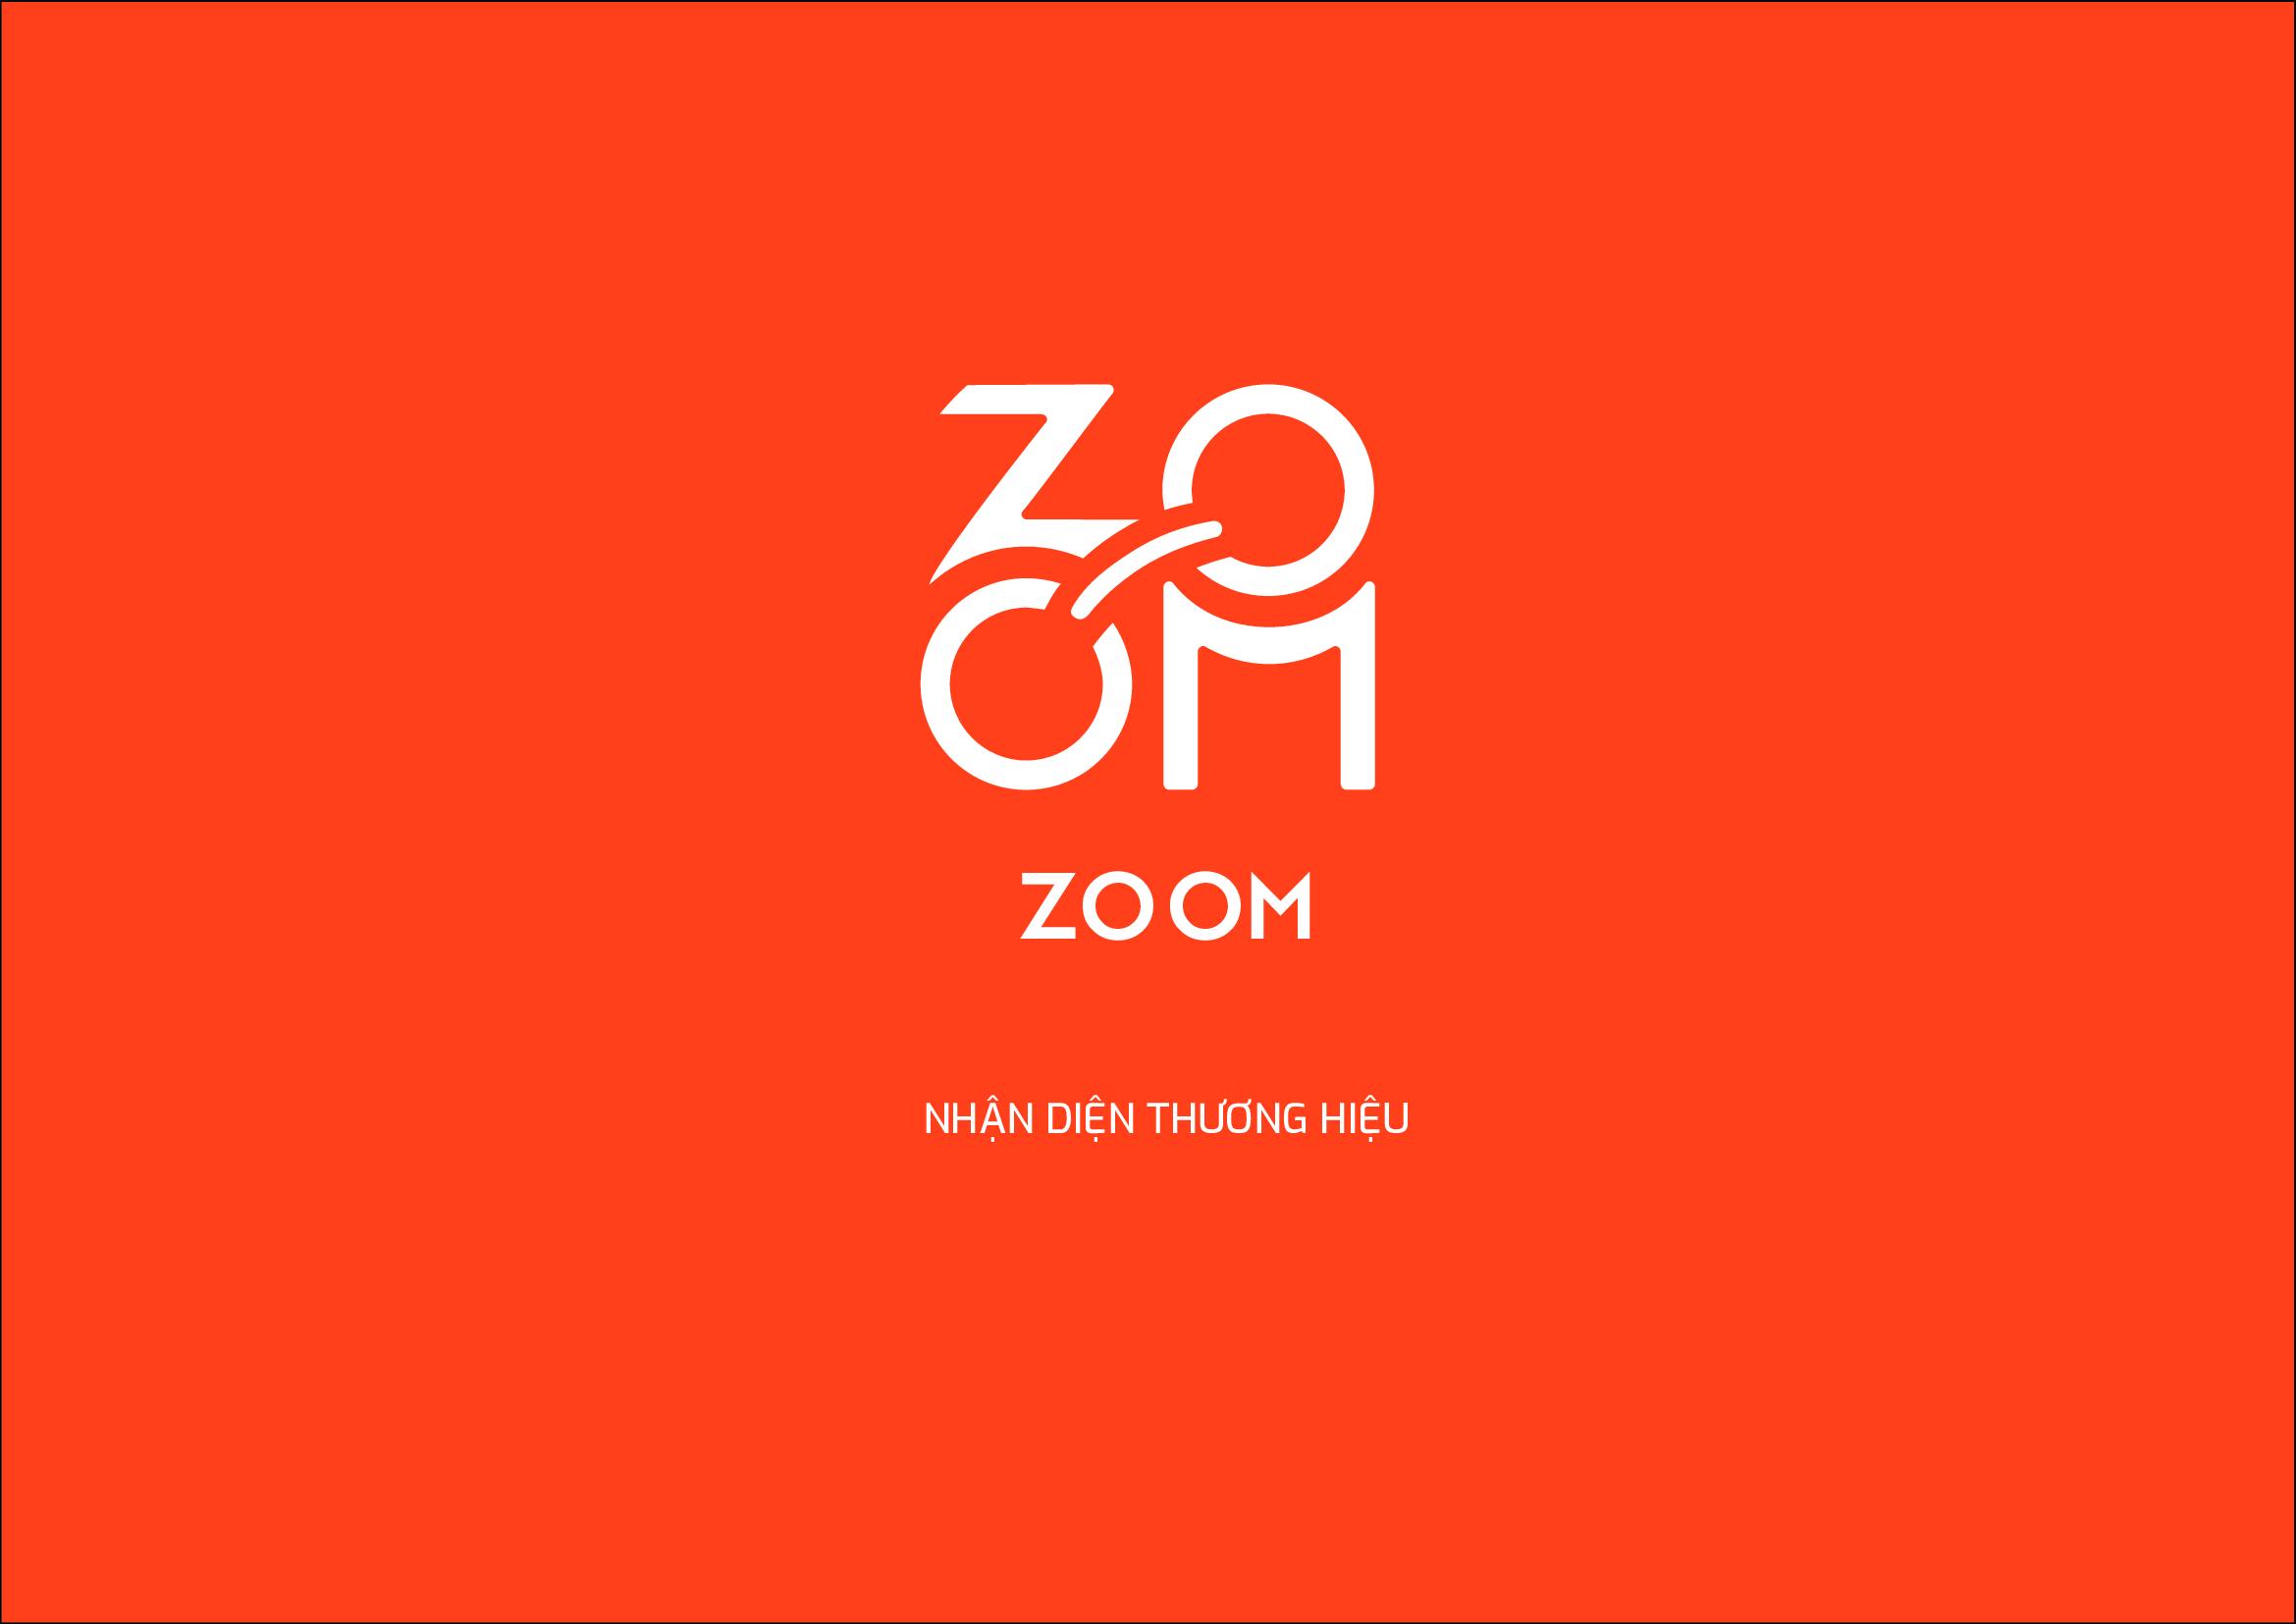 Project sem 1 | ZOOM | Lớp A1.2103.M